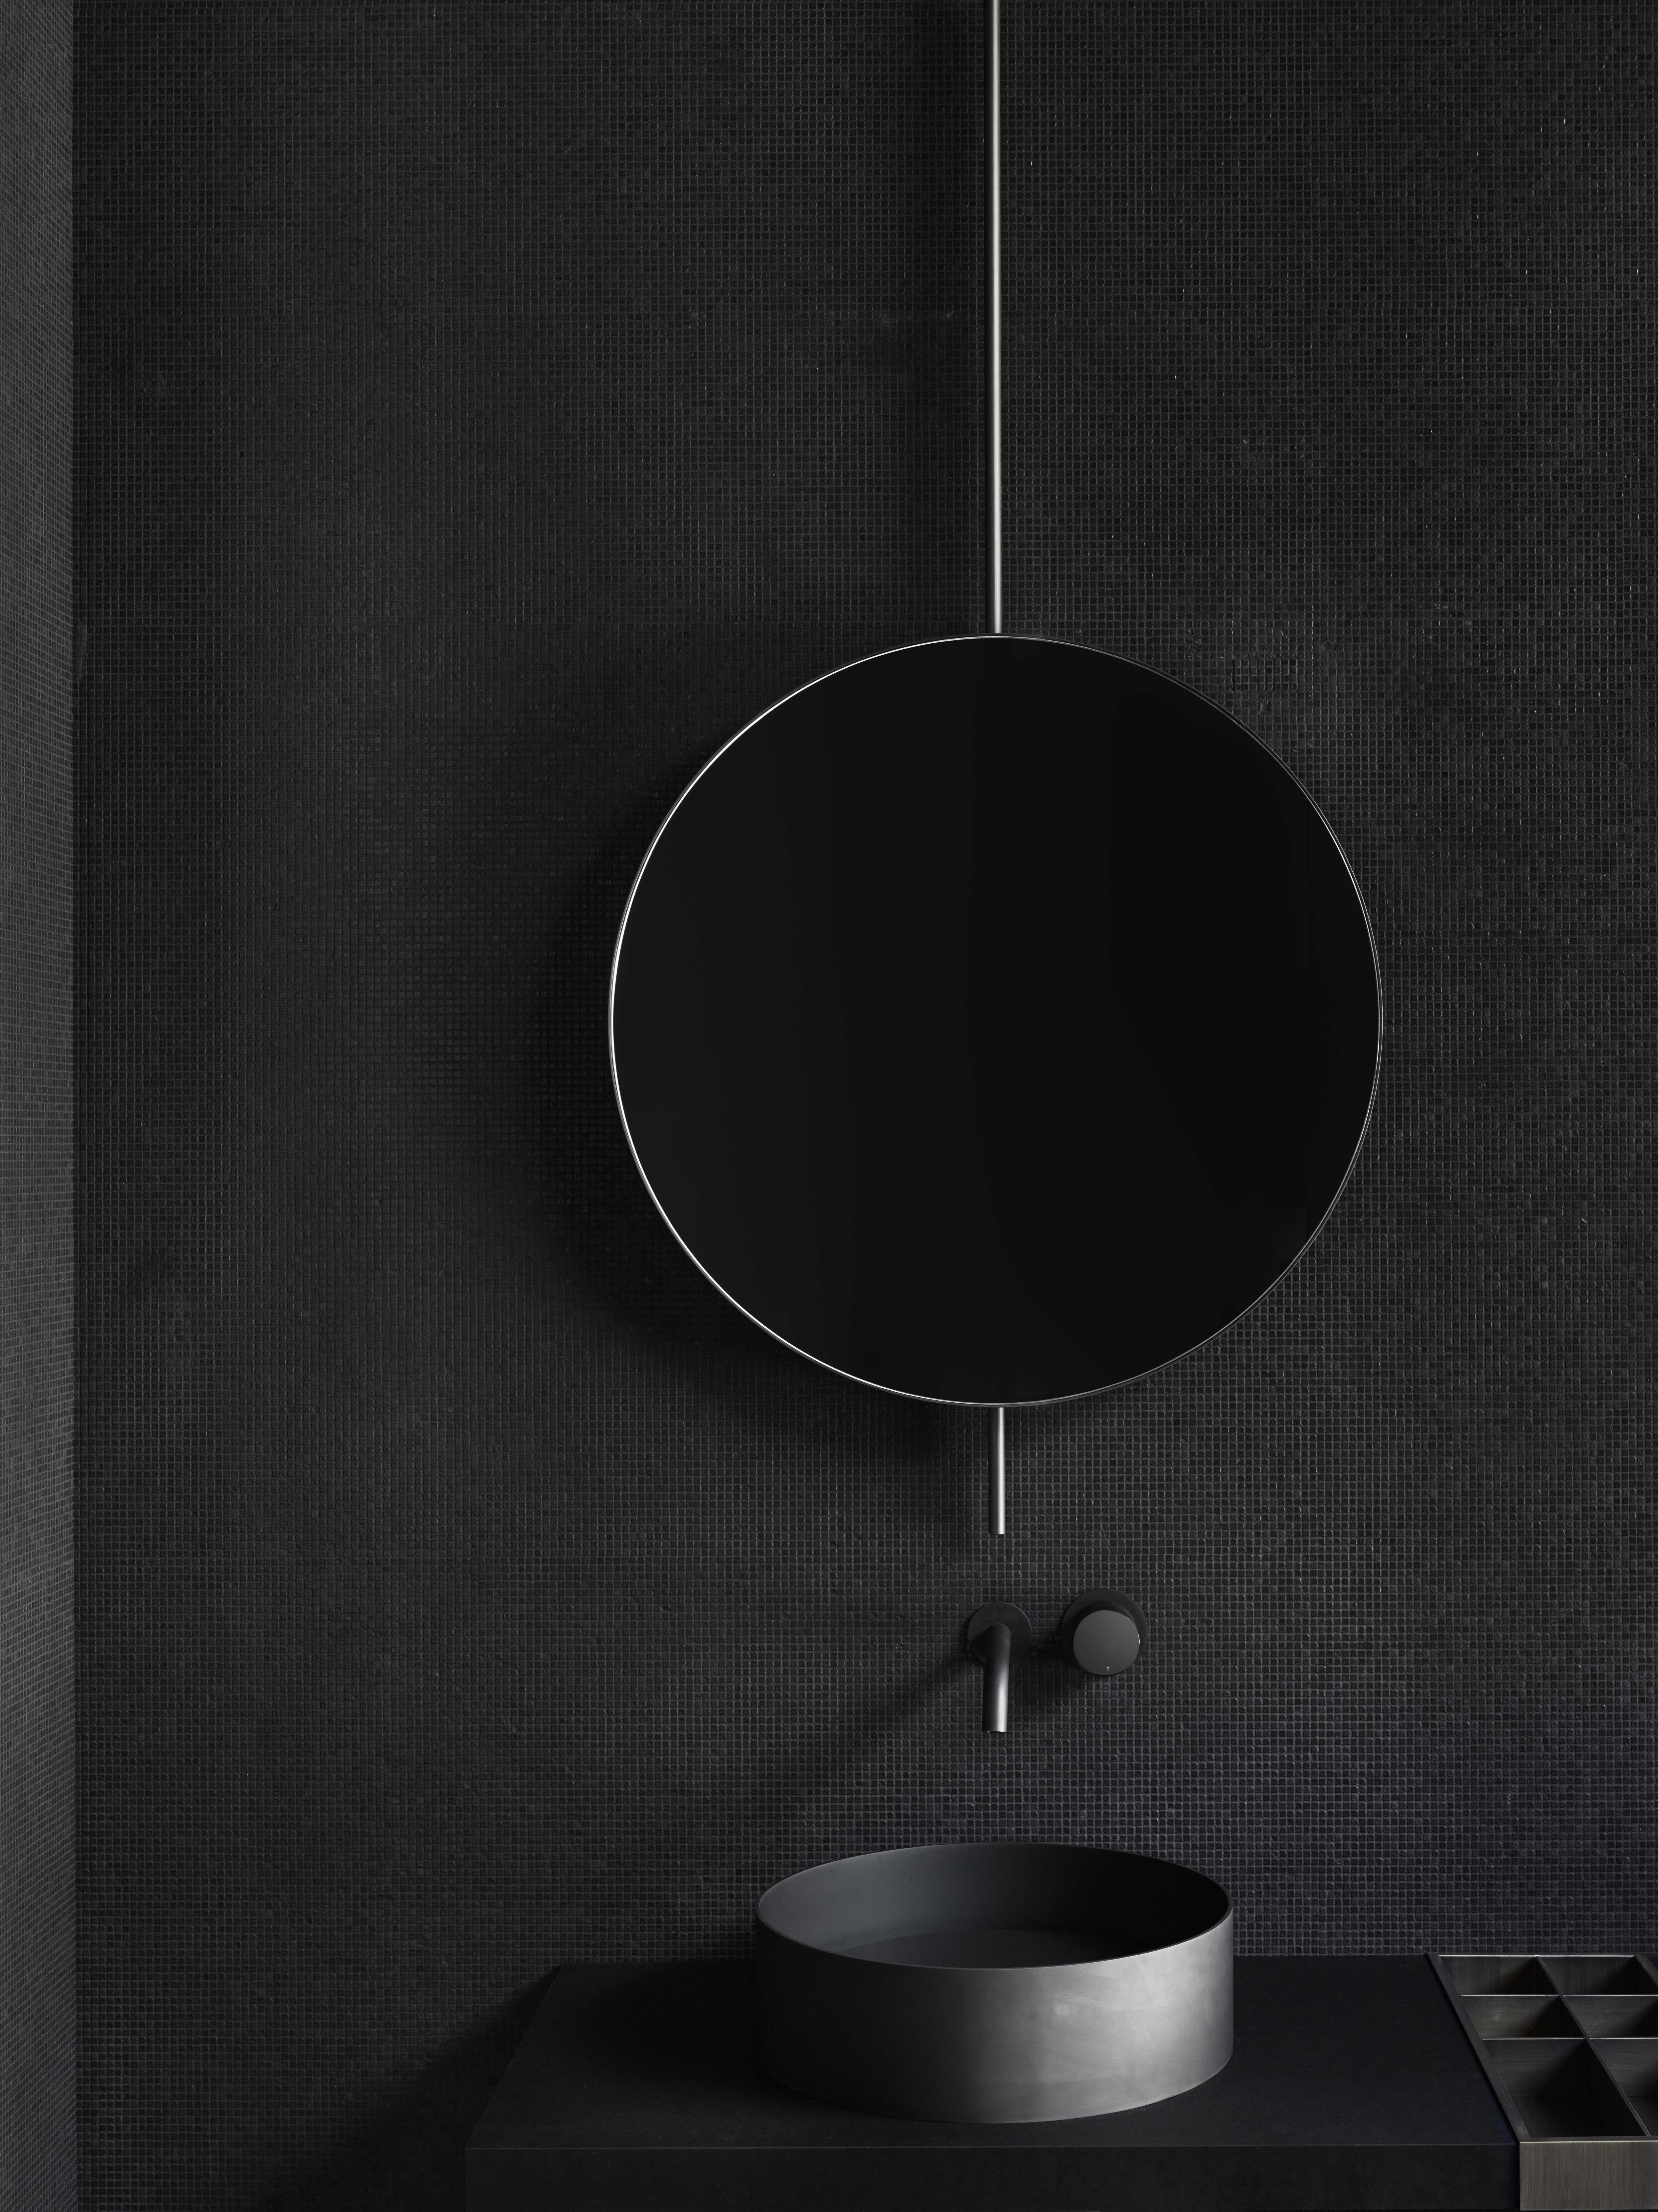 Boffi Bagno Moderno.Elementi Mirror 2017 Boffi Photograph By Tommaso Sartori